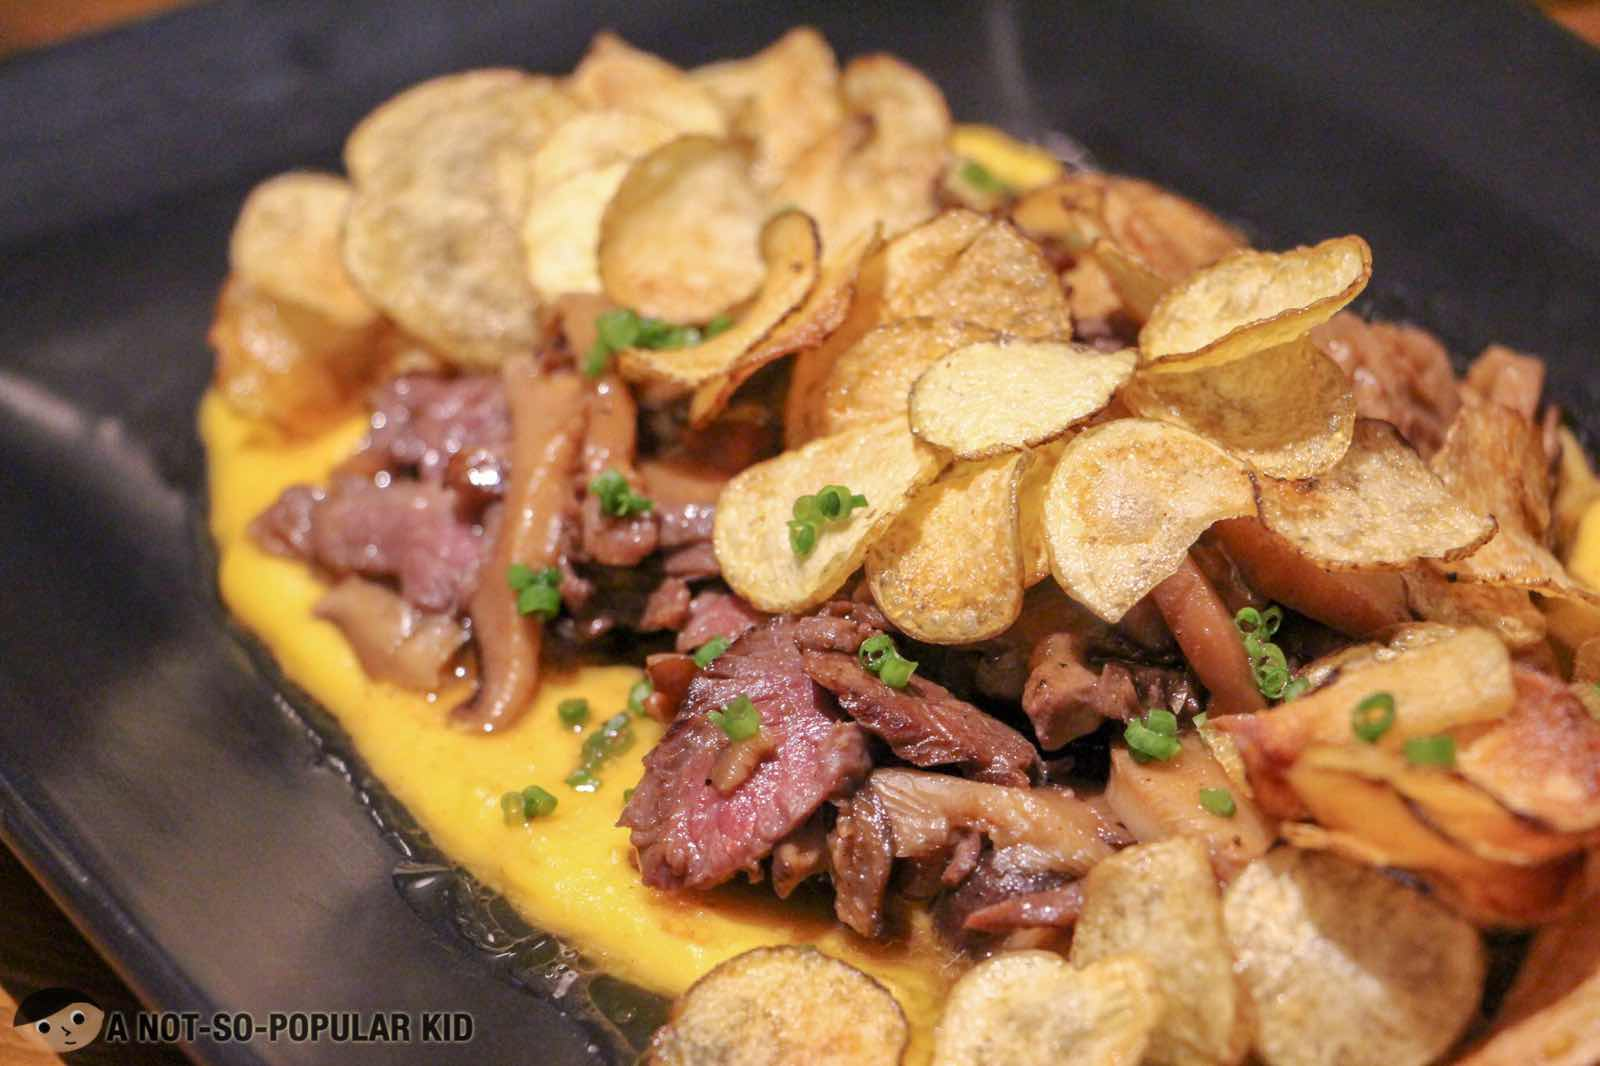 Ooma's Vibrant Modern Japanese Cuisine